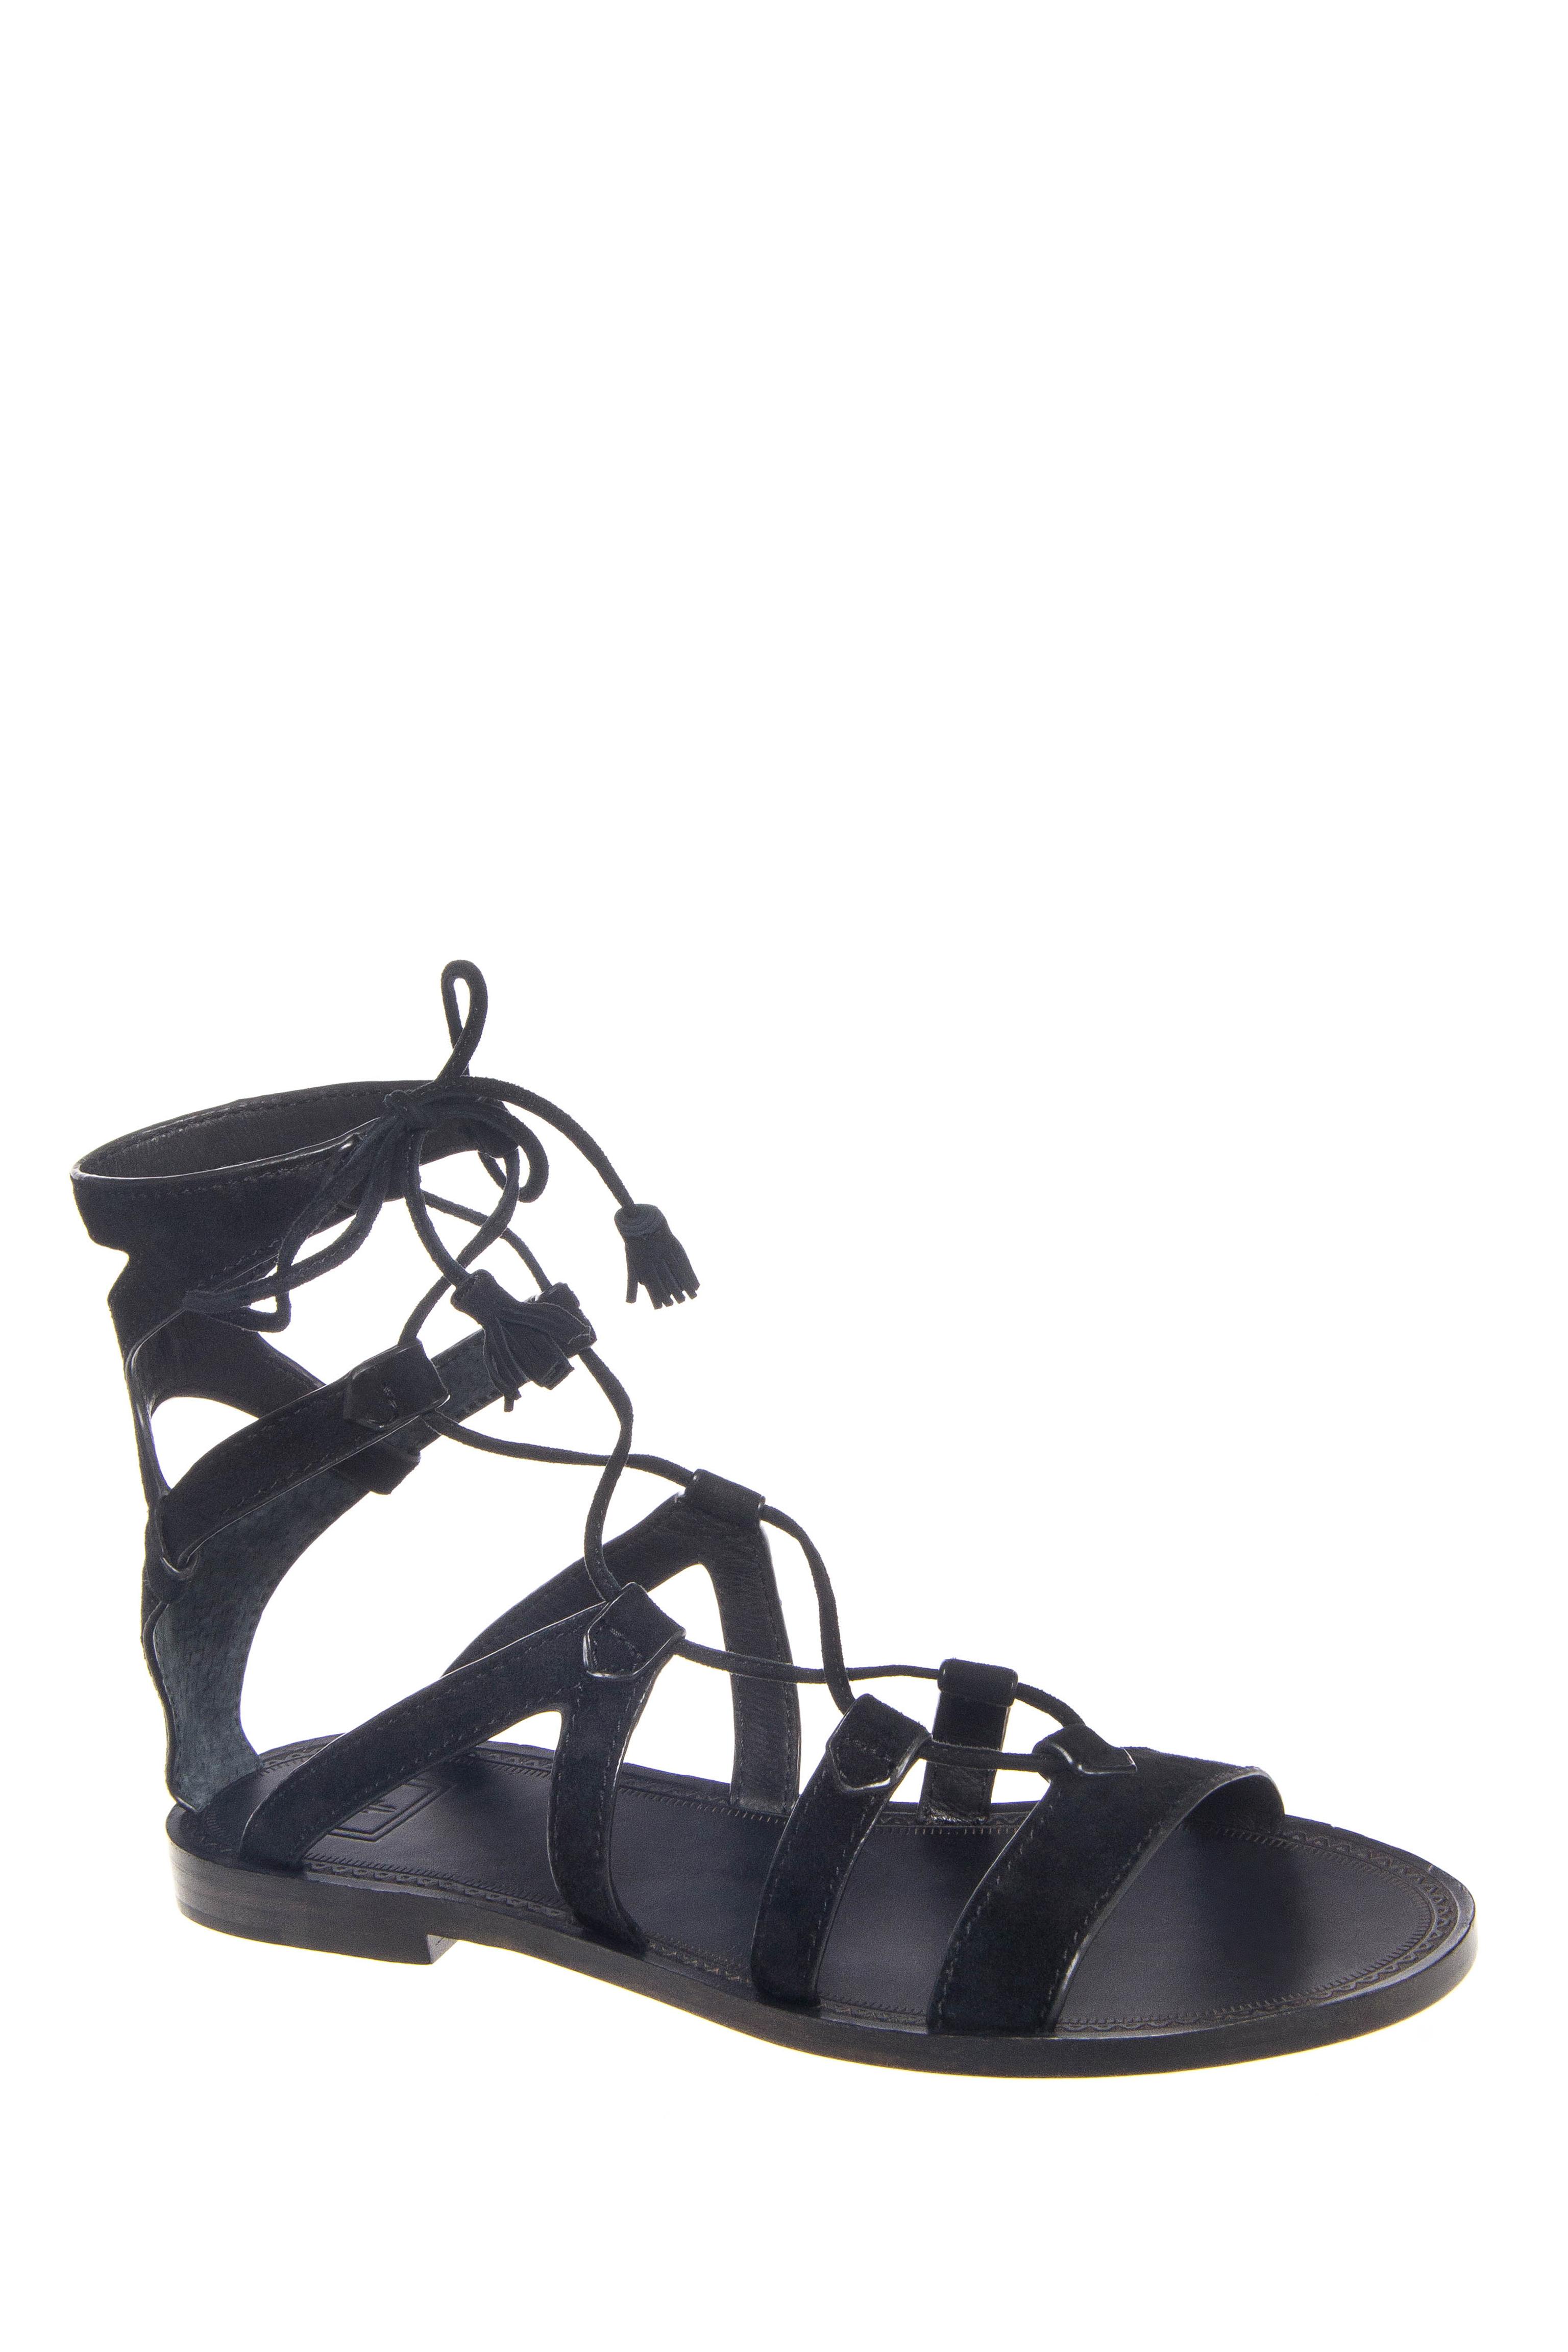 Frye Ruth Gladiator Sandals - Black